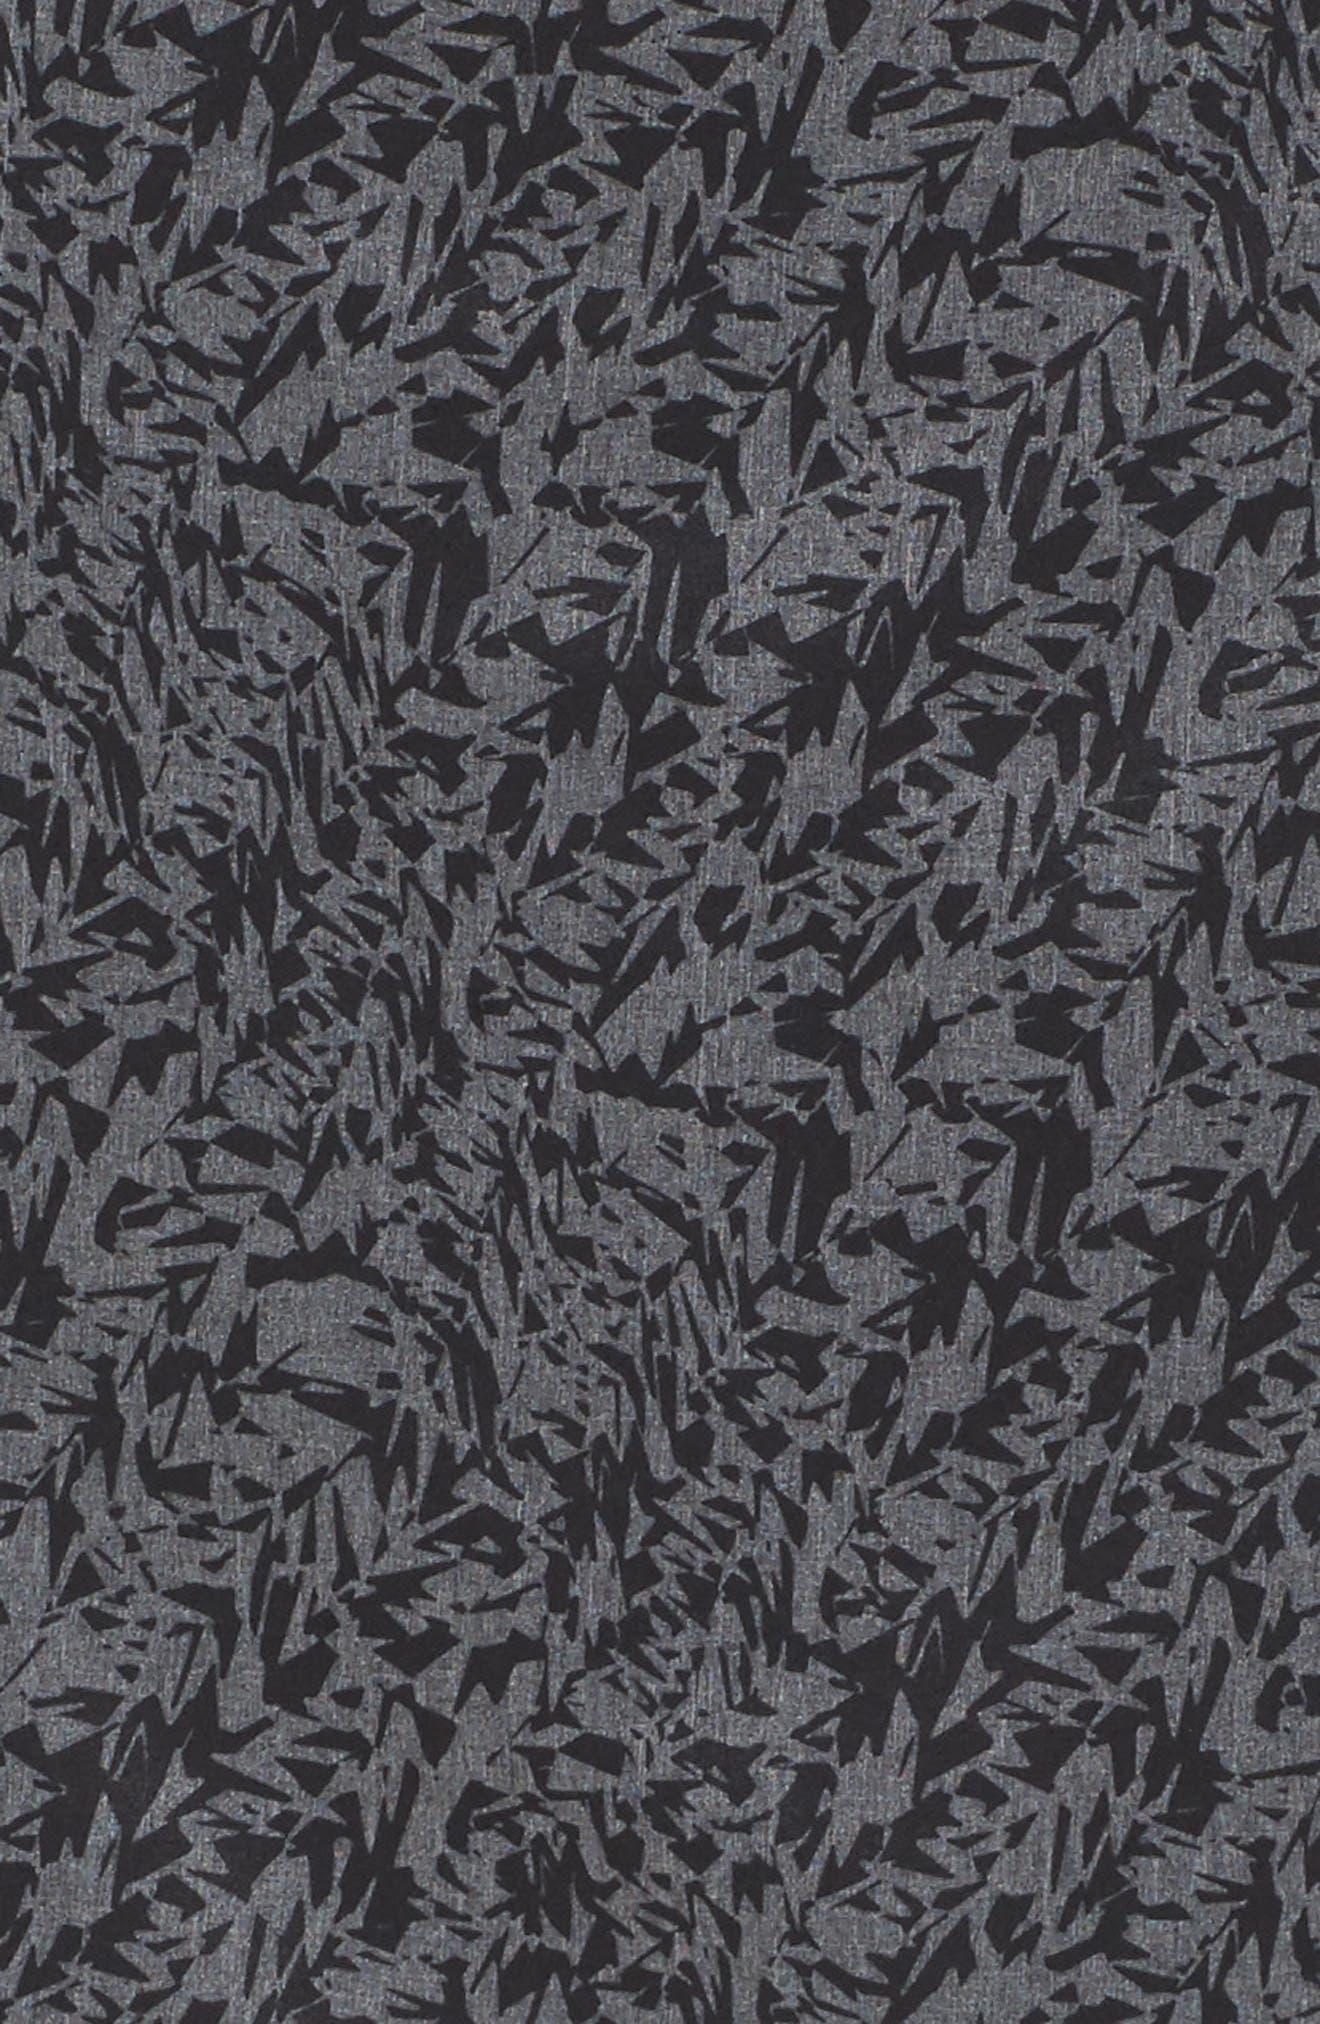 Rangewear Skort,                             Alternate thumbnail 6, color,                             Black